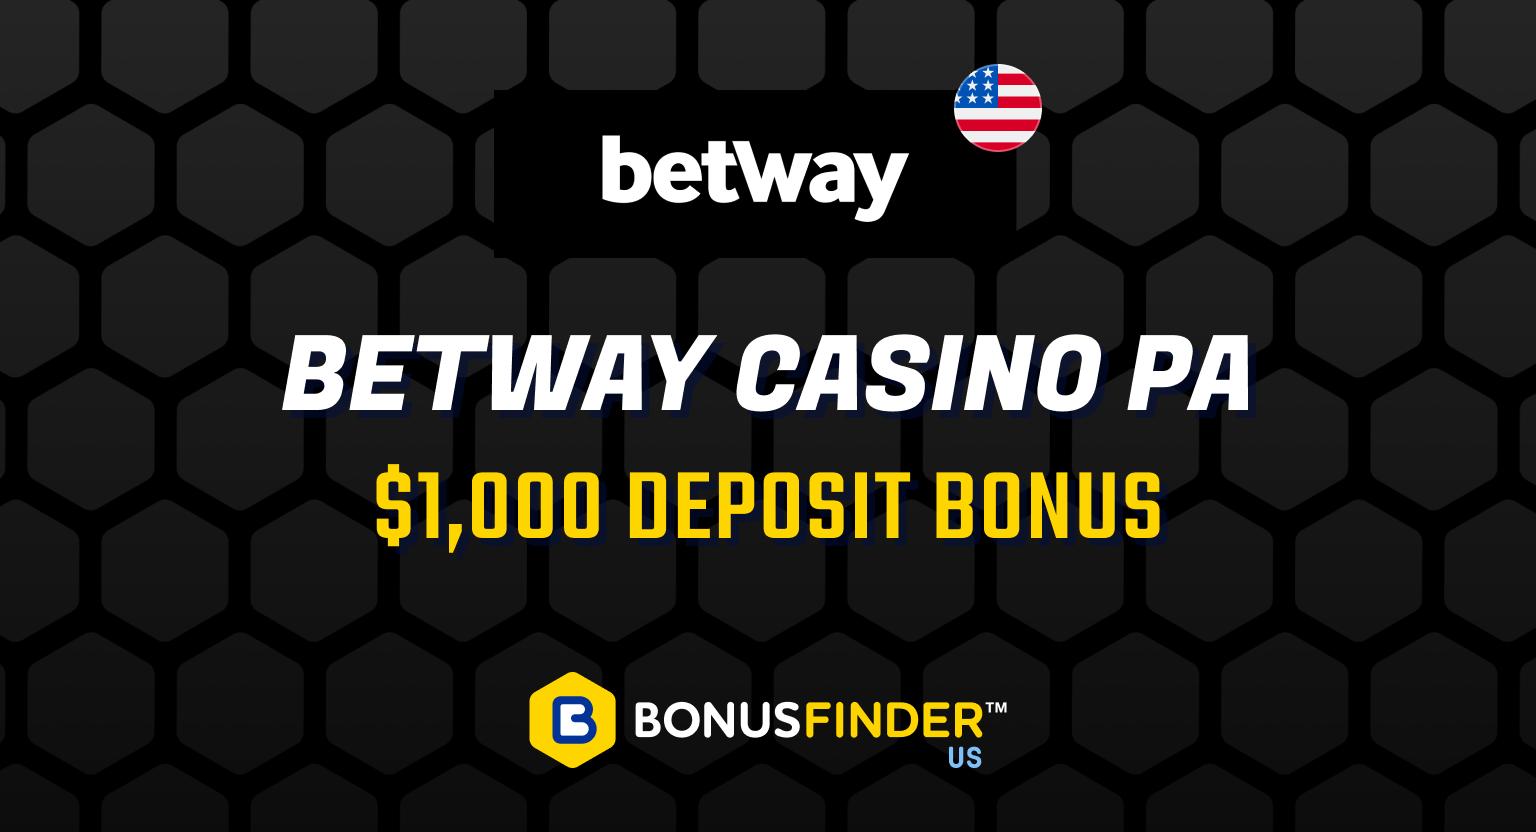 Betway Casino PA